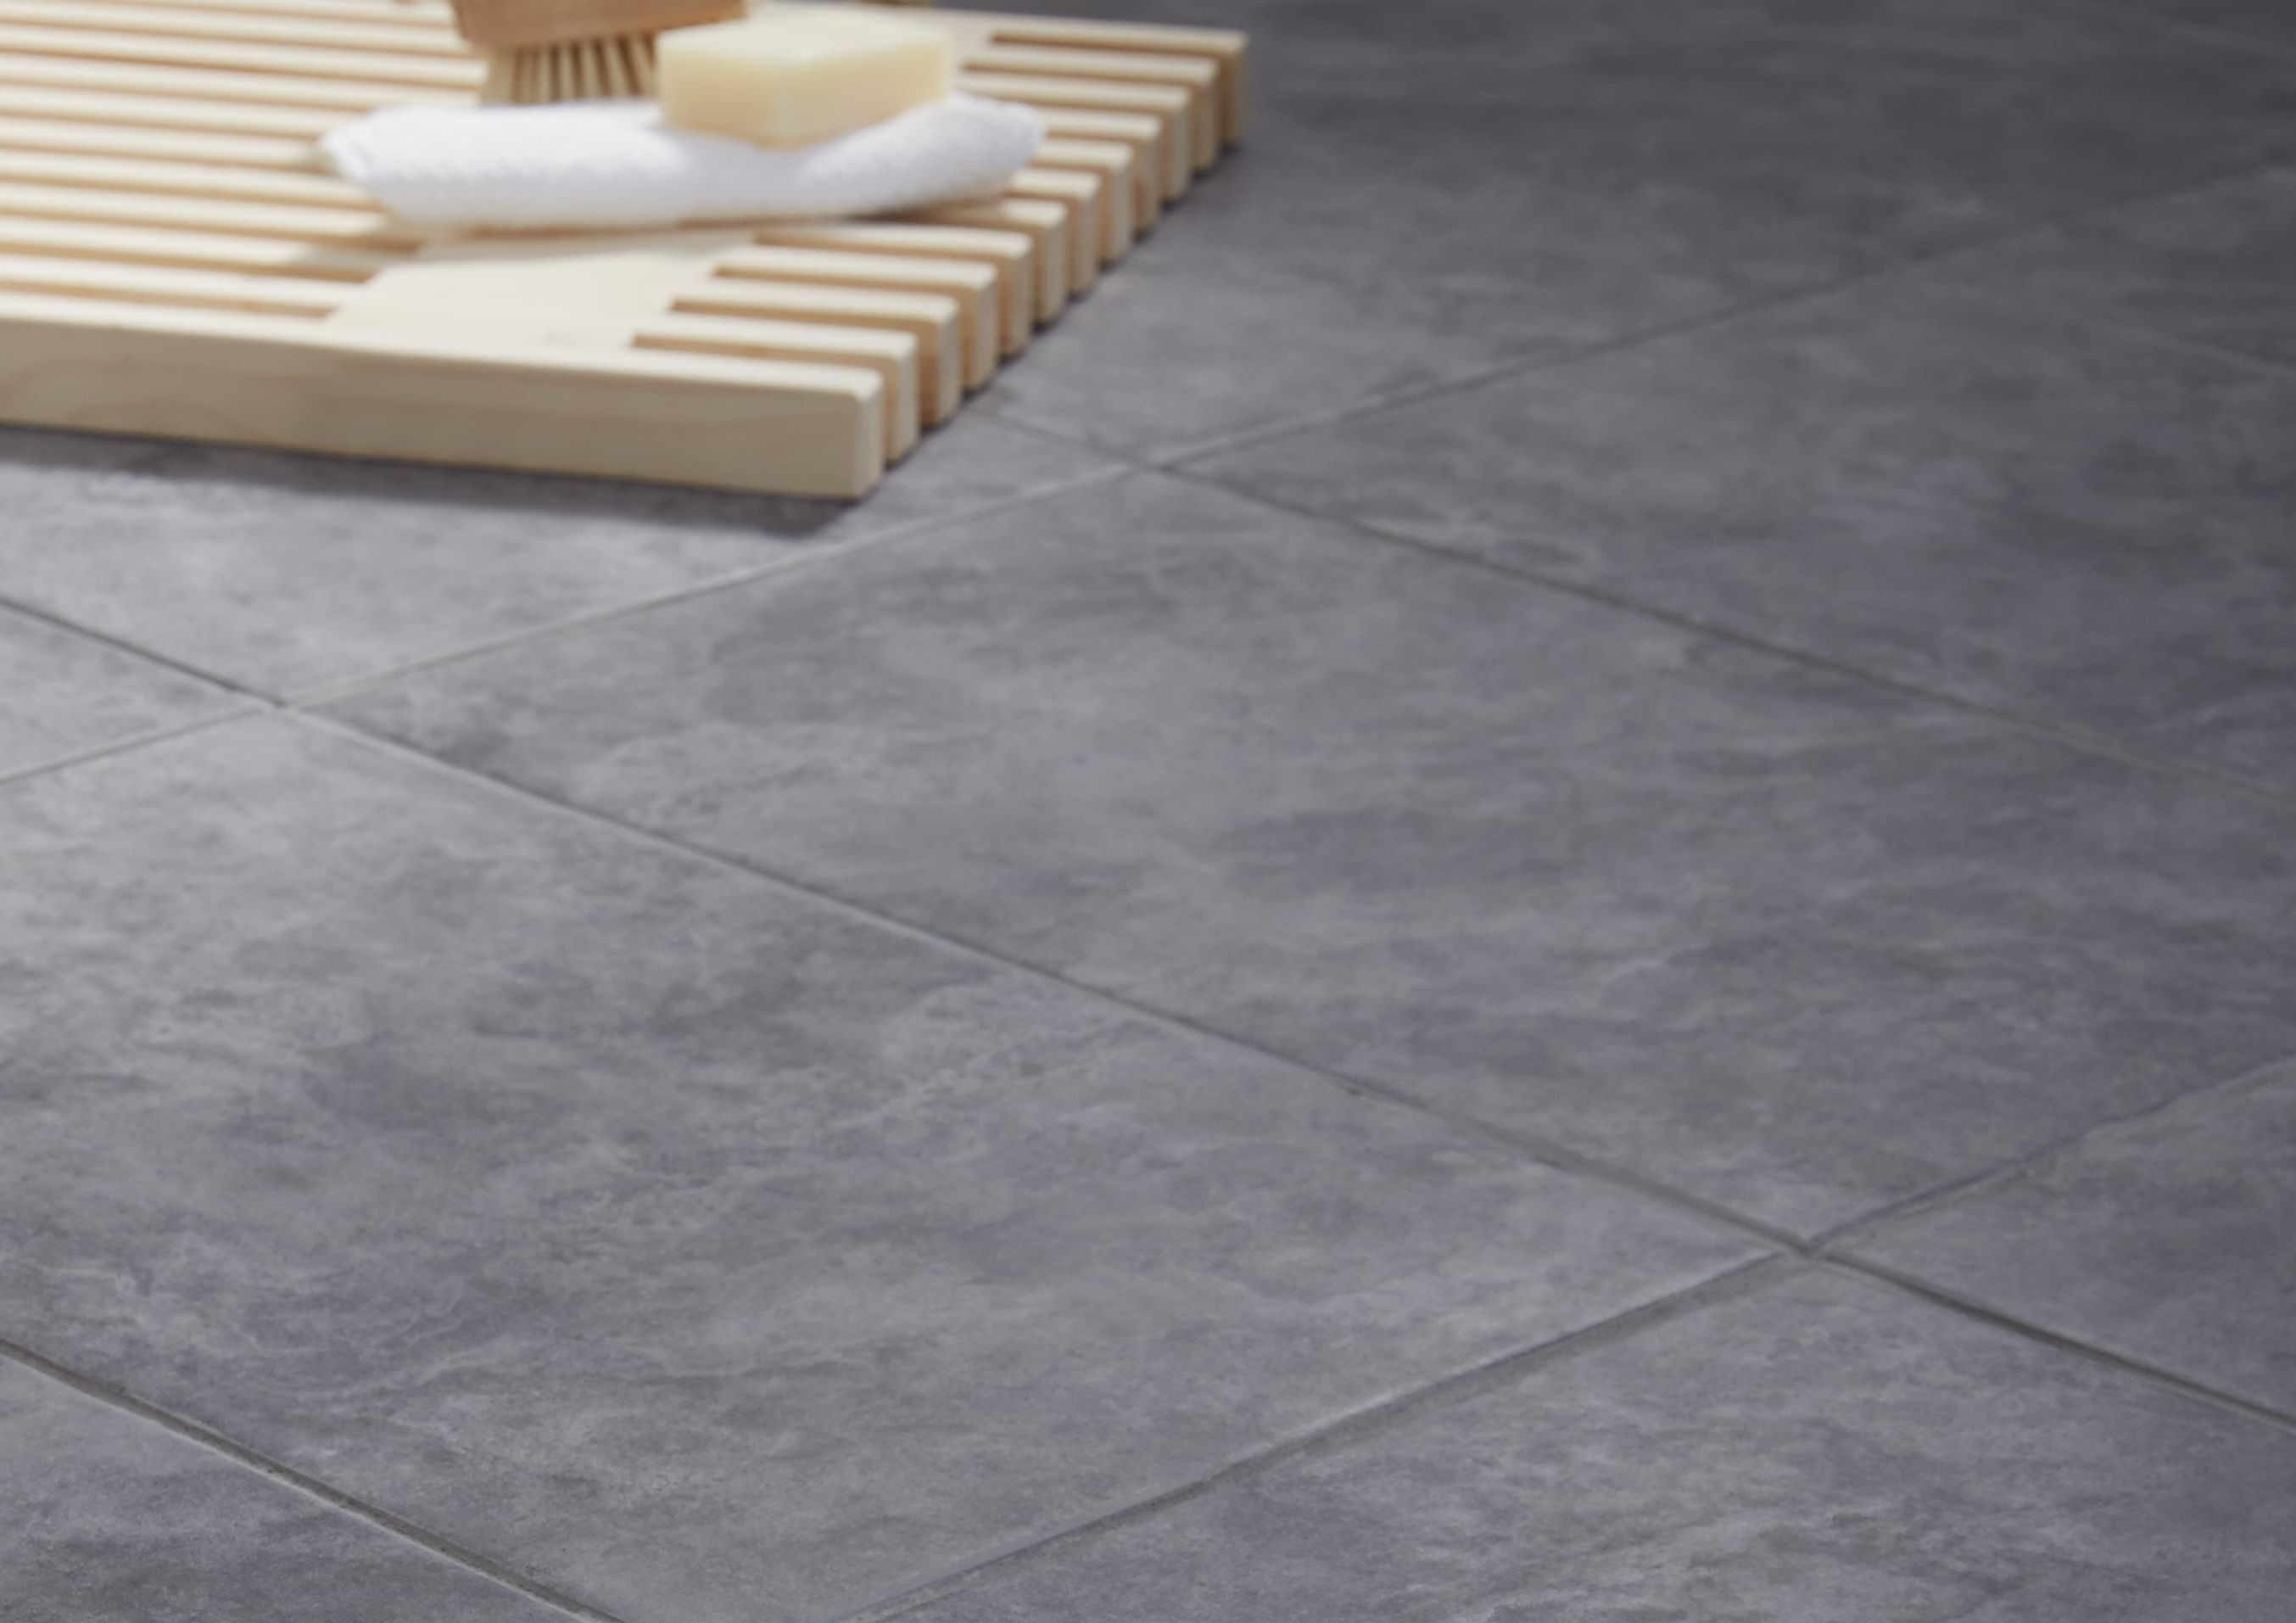 Kitchen Tiles B Q flooring at b&q – meze blog